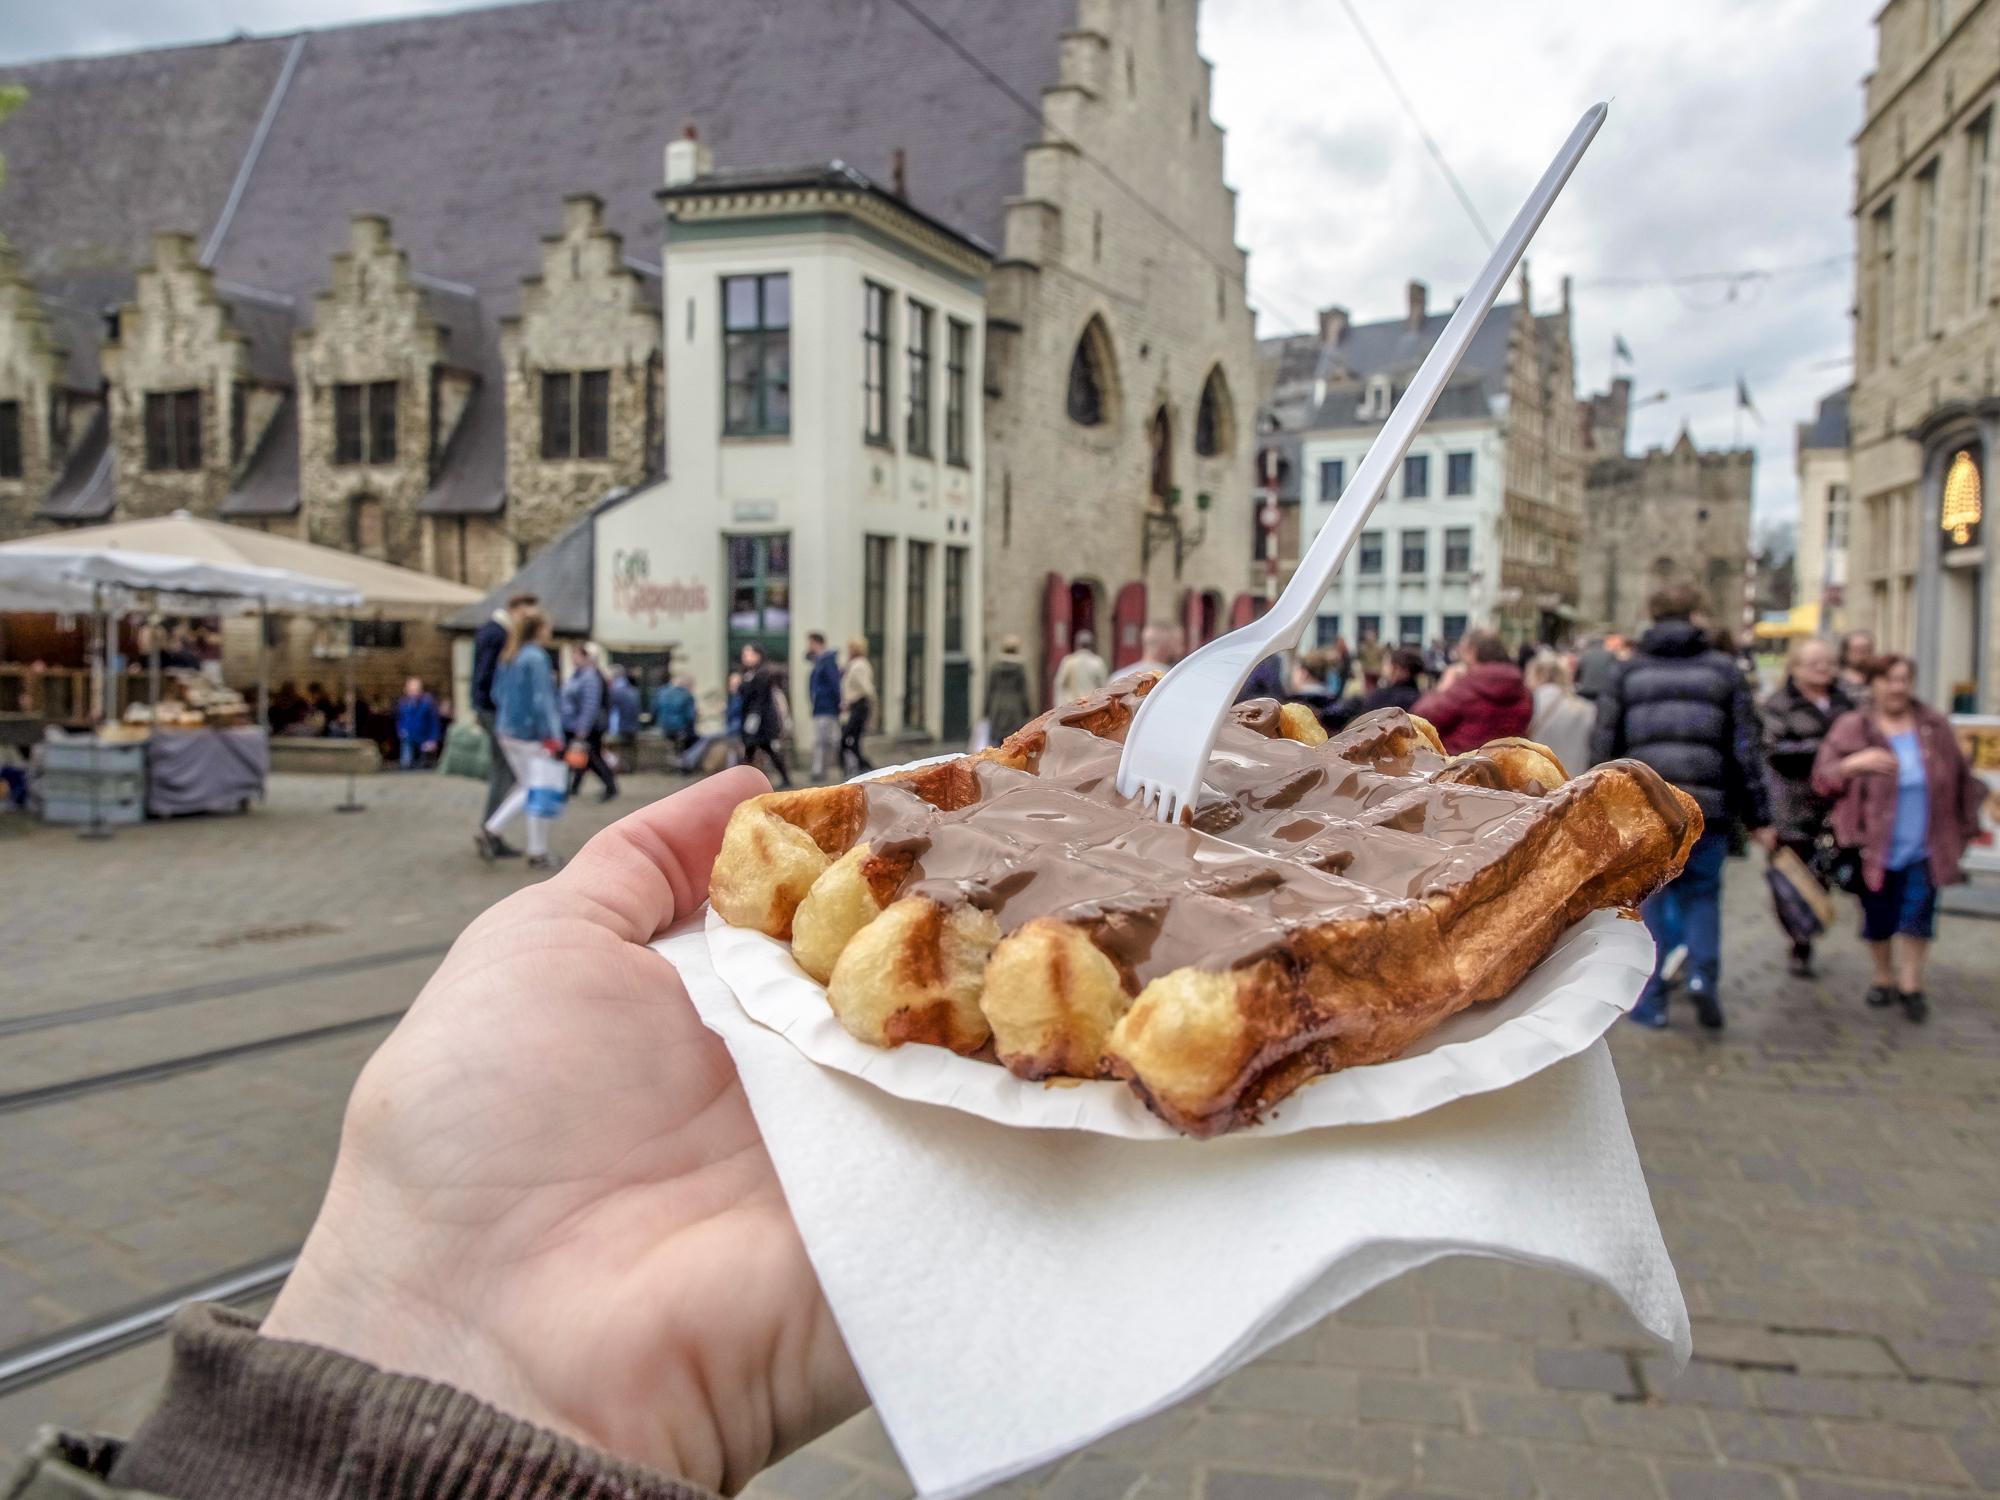 4 Cities in 4 Days in Belgium, Oh My! – MY WANDERLUSTY LIFE